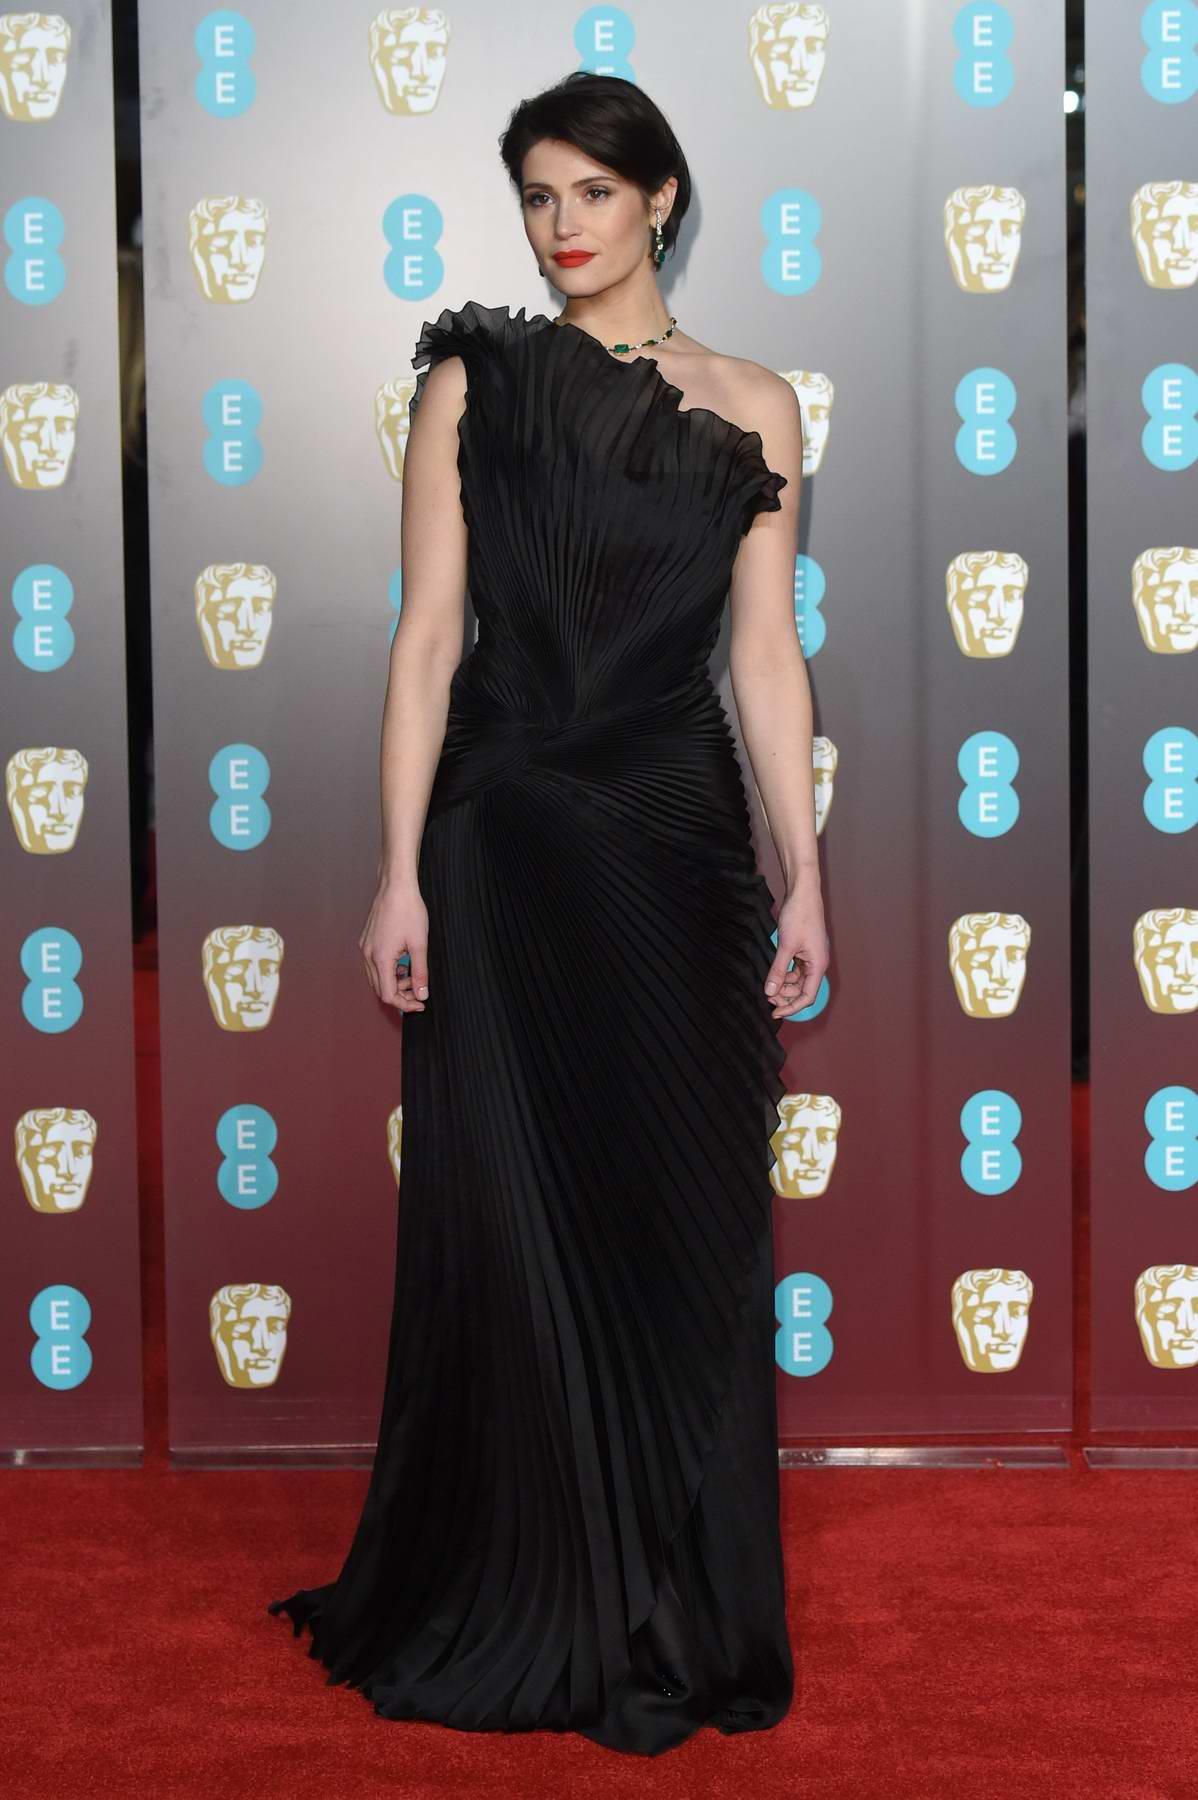 Gemma Arterton attends 71st British Academy Film Awards at Royal Albert Hall in London